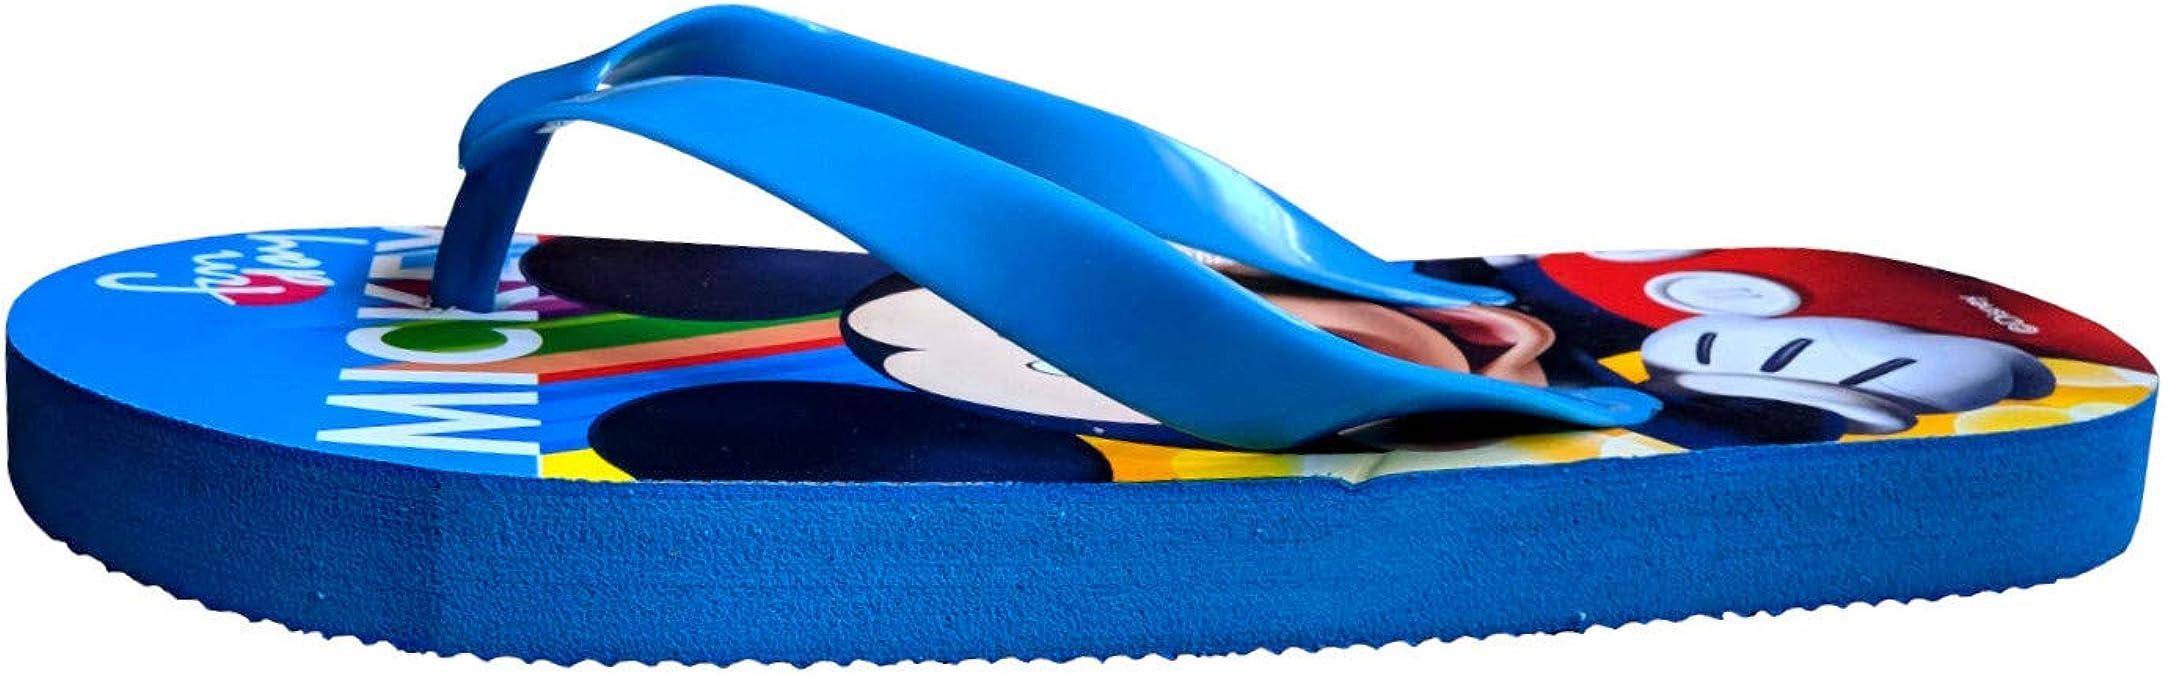 Mickey Tongs Gar/çons Rouges Lanieres Bleues